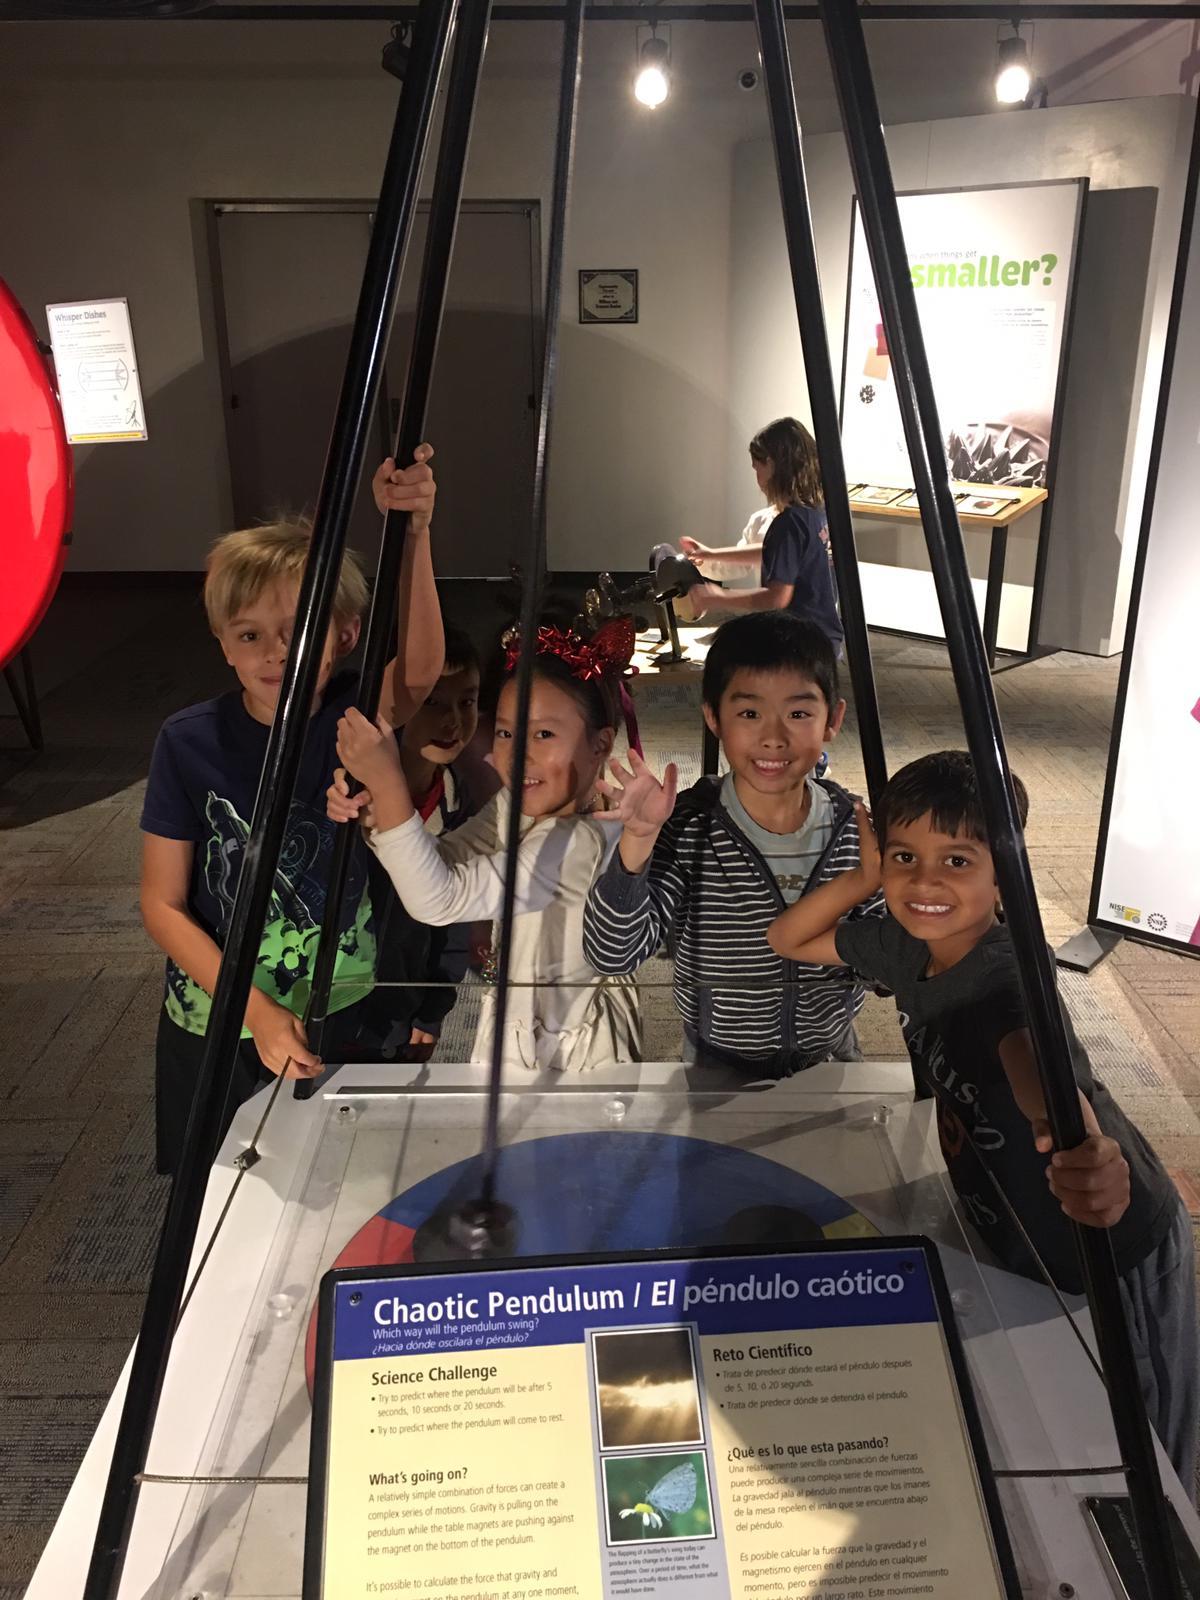 Giant pendulum